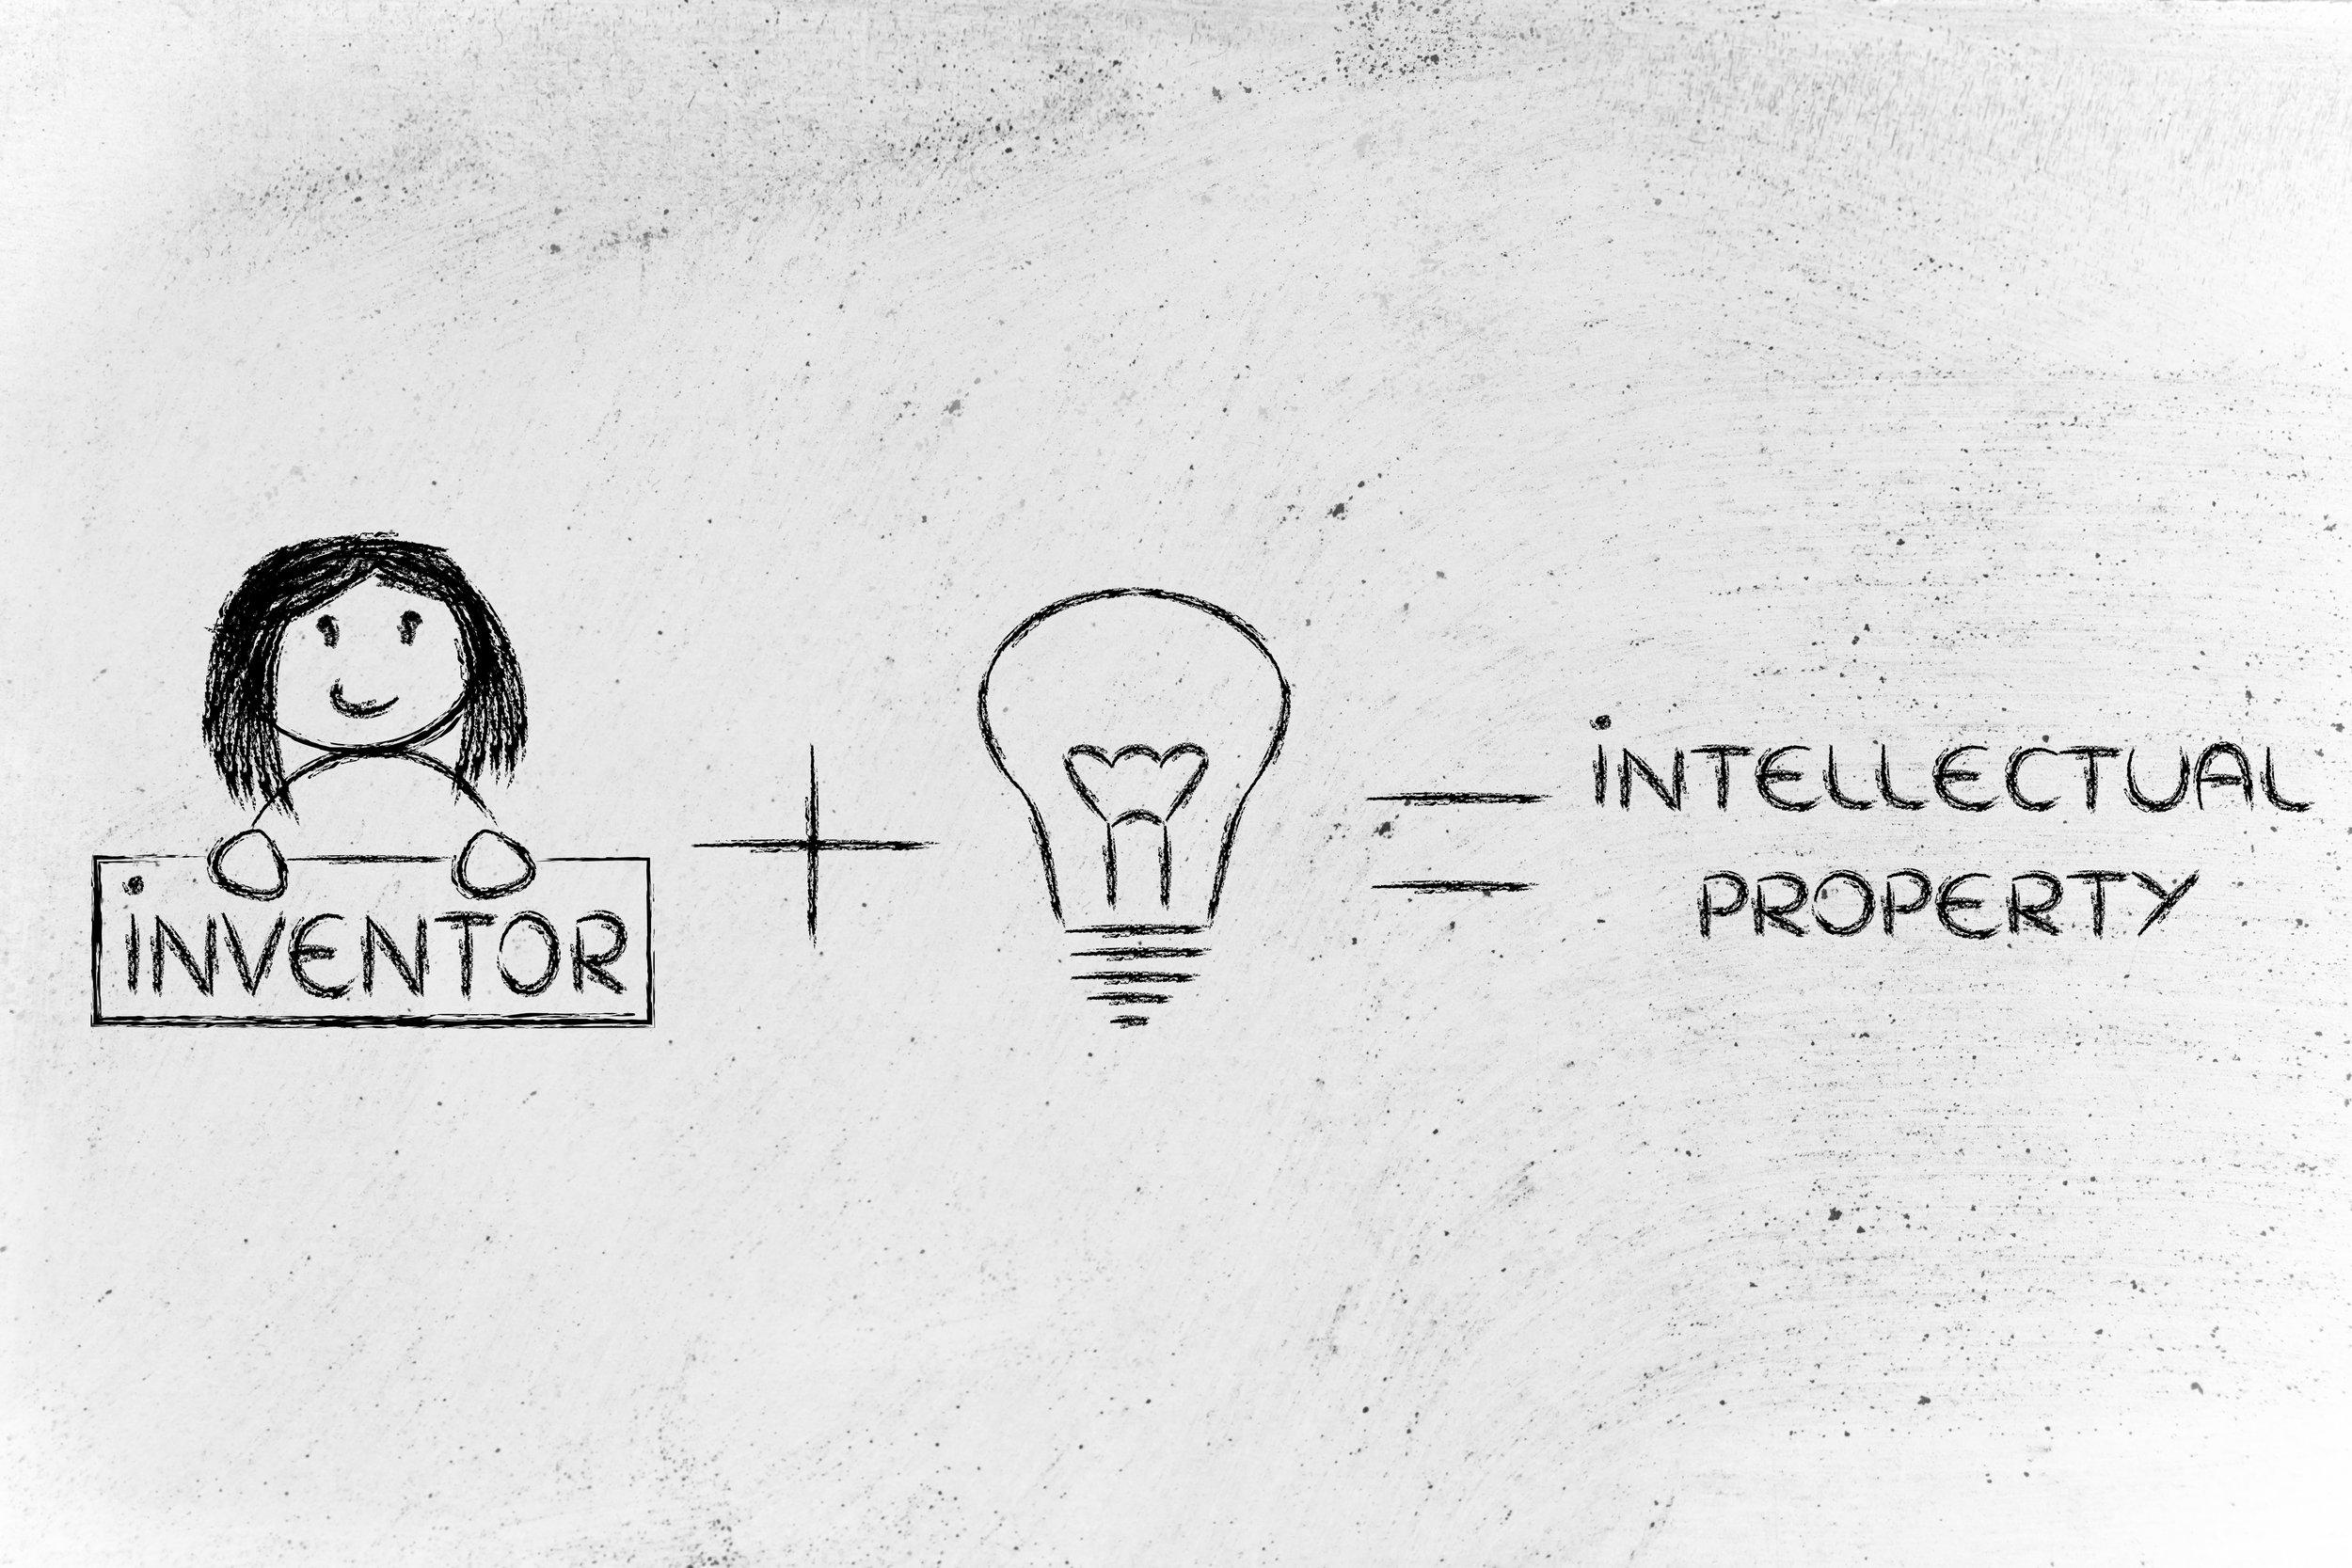 Inventor .jpg